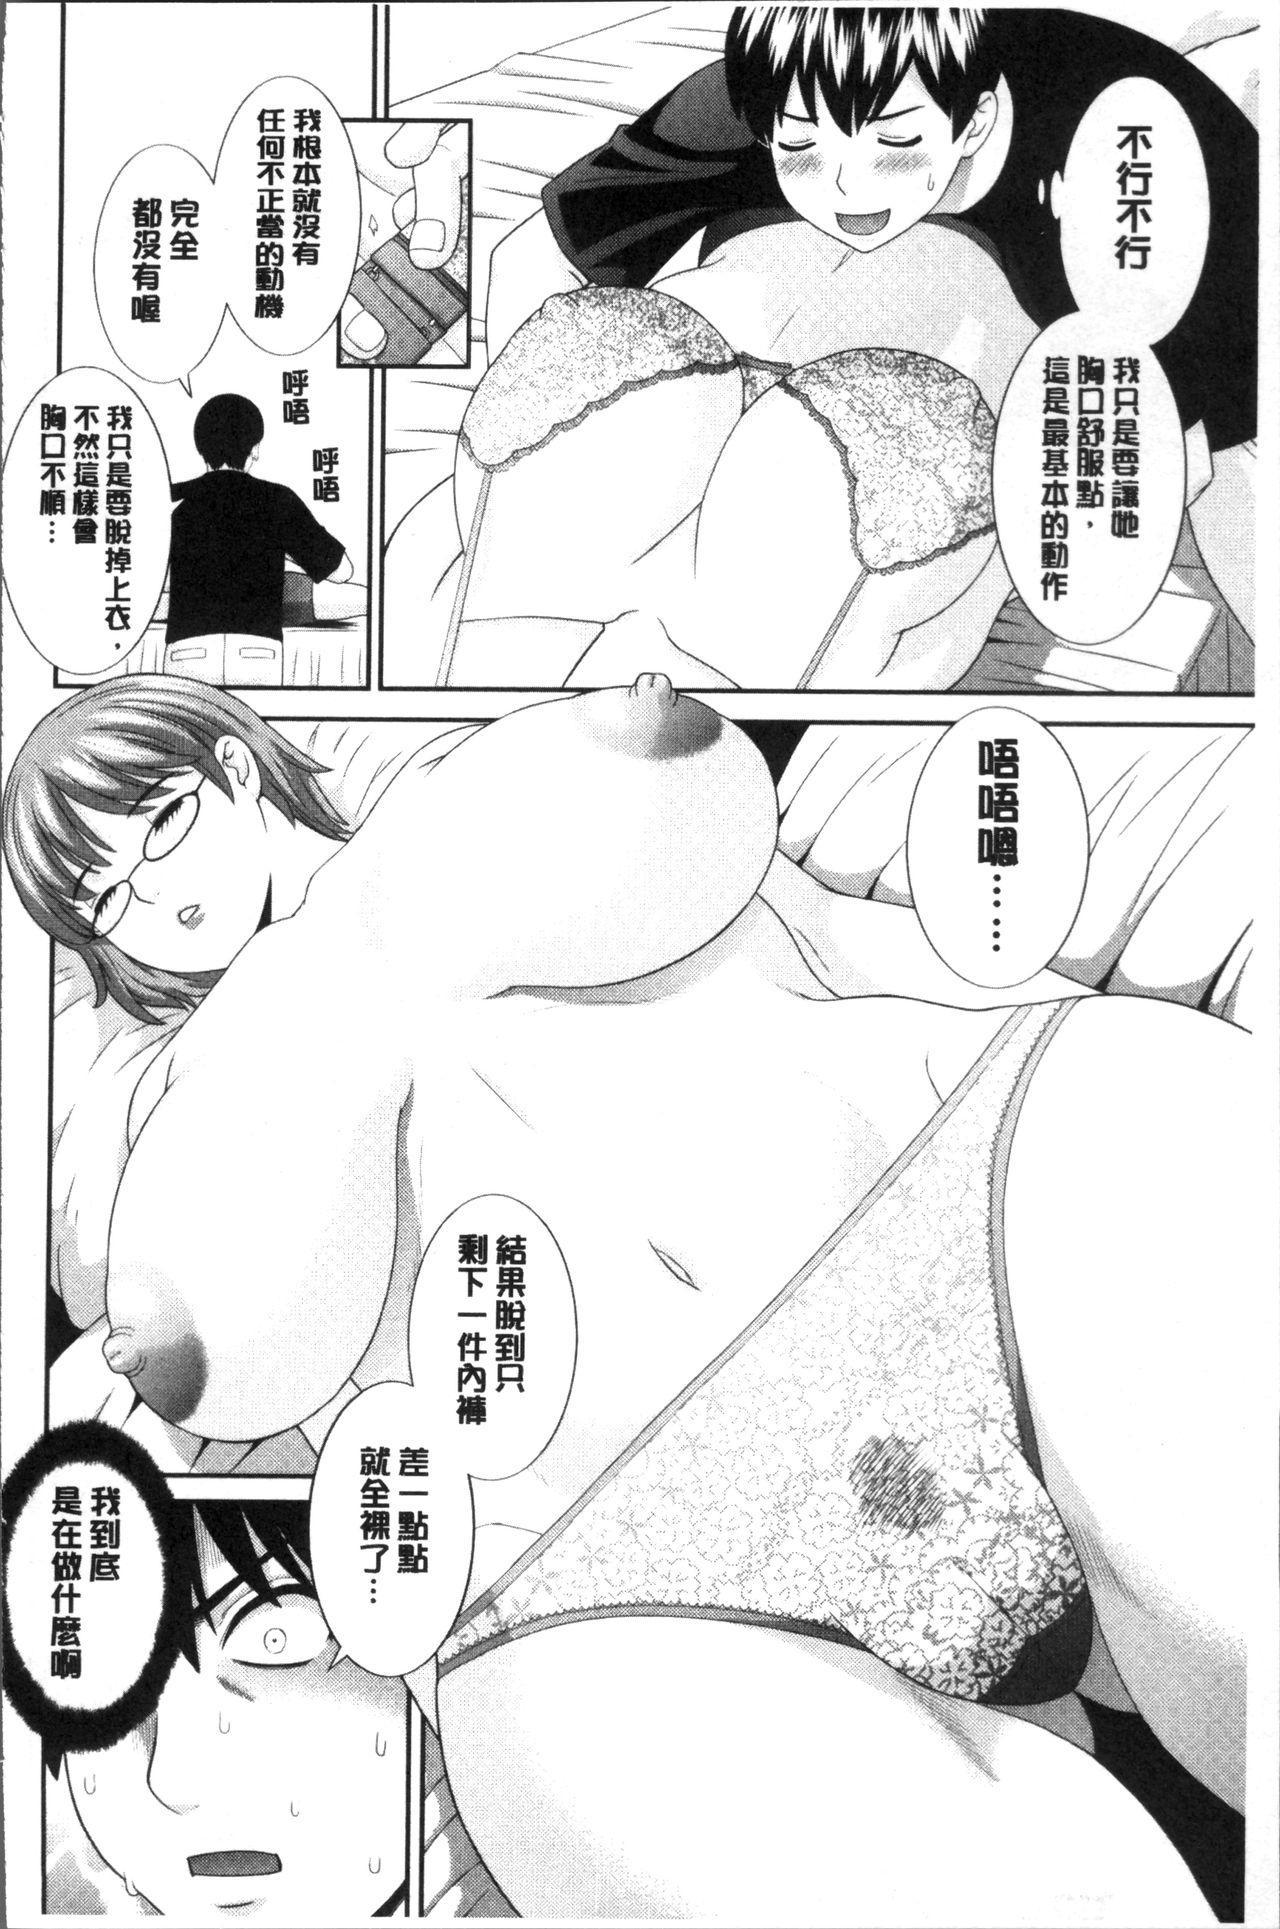 [Kawamori Misaki] Innyuu Shufu no Futei Ganbou - Oku-san to Kanojo to 2 | 淫乳主婦的不貞願望 和人妻也和女友❤2 [Chinese] 31